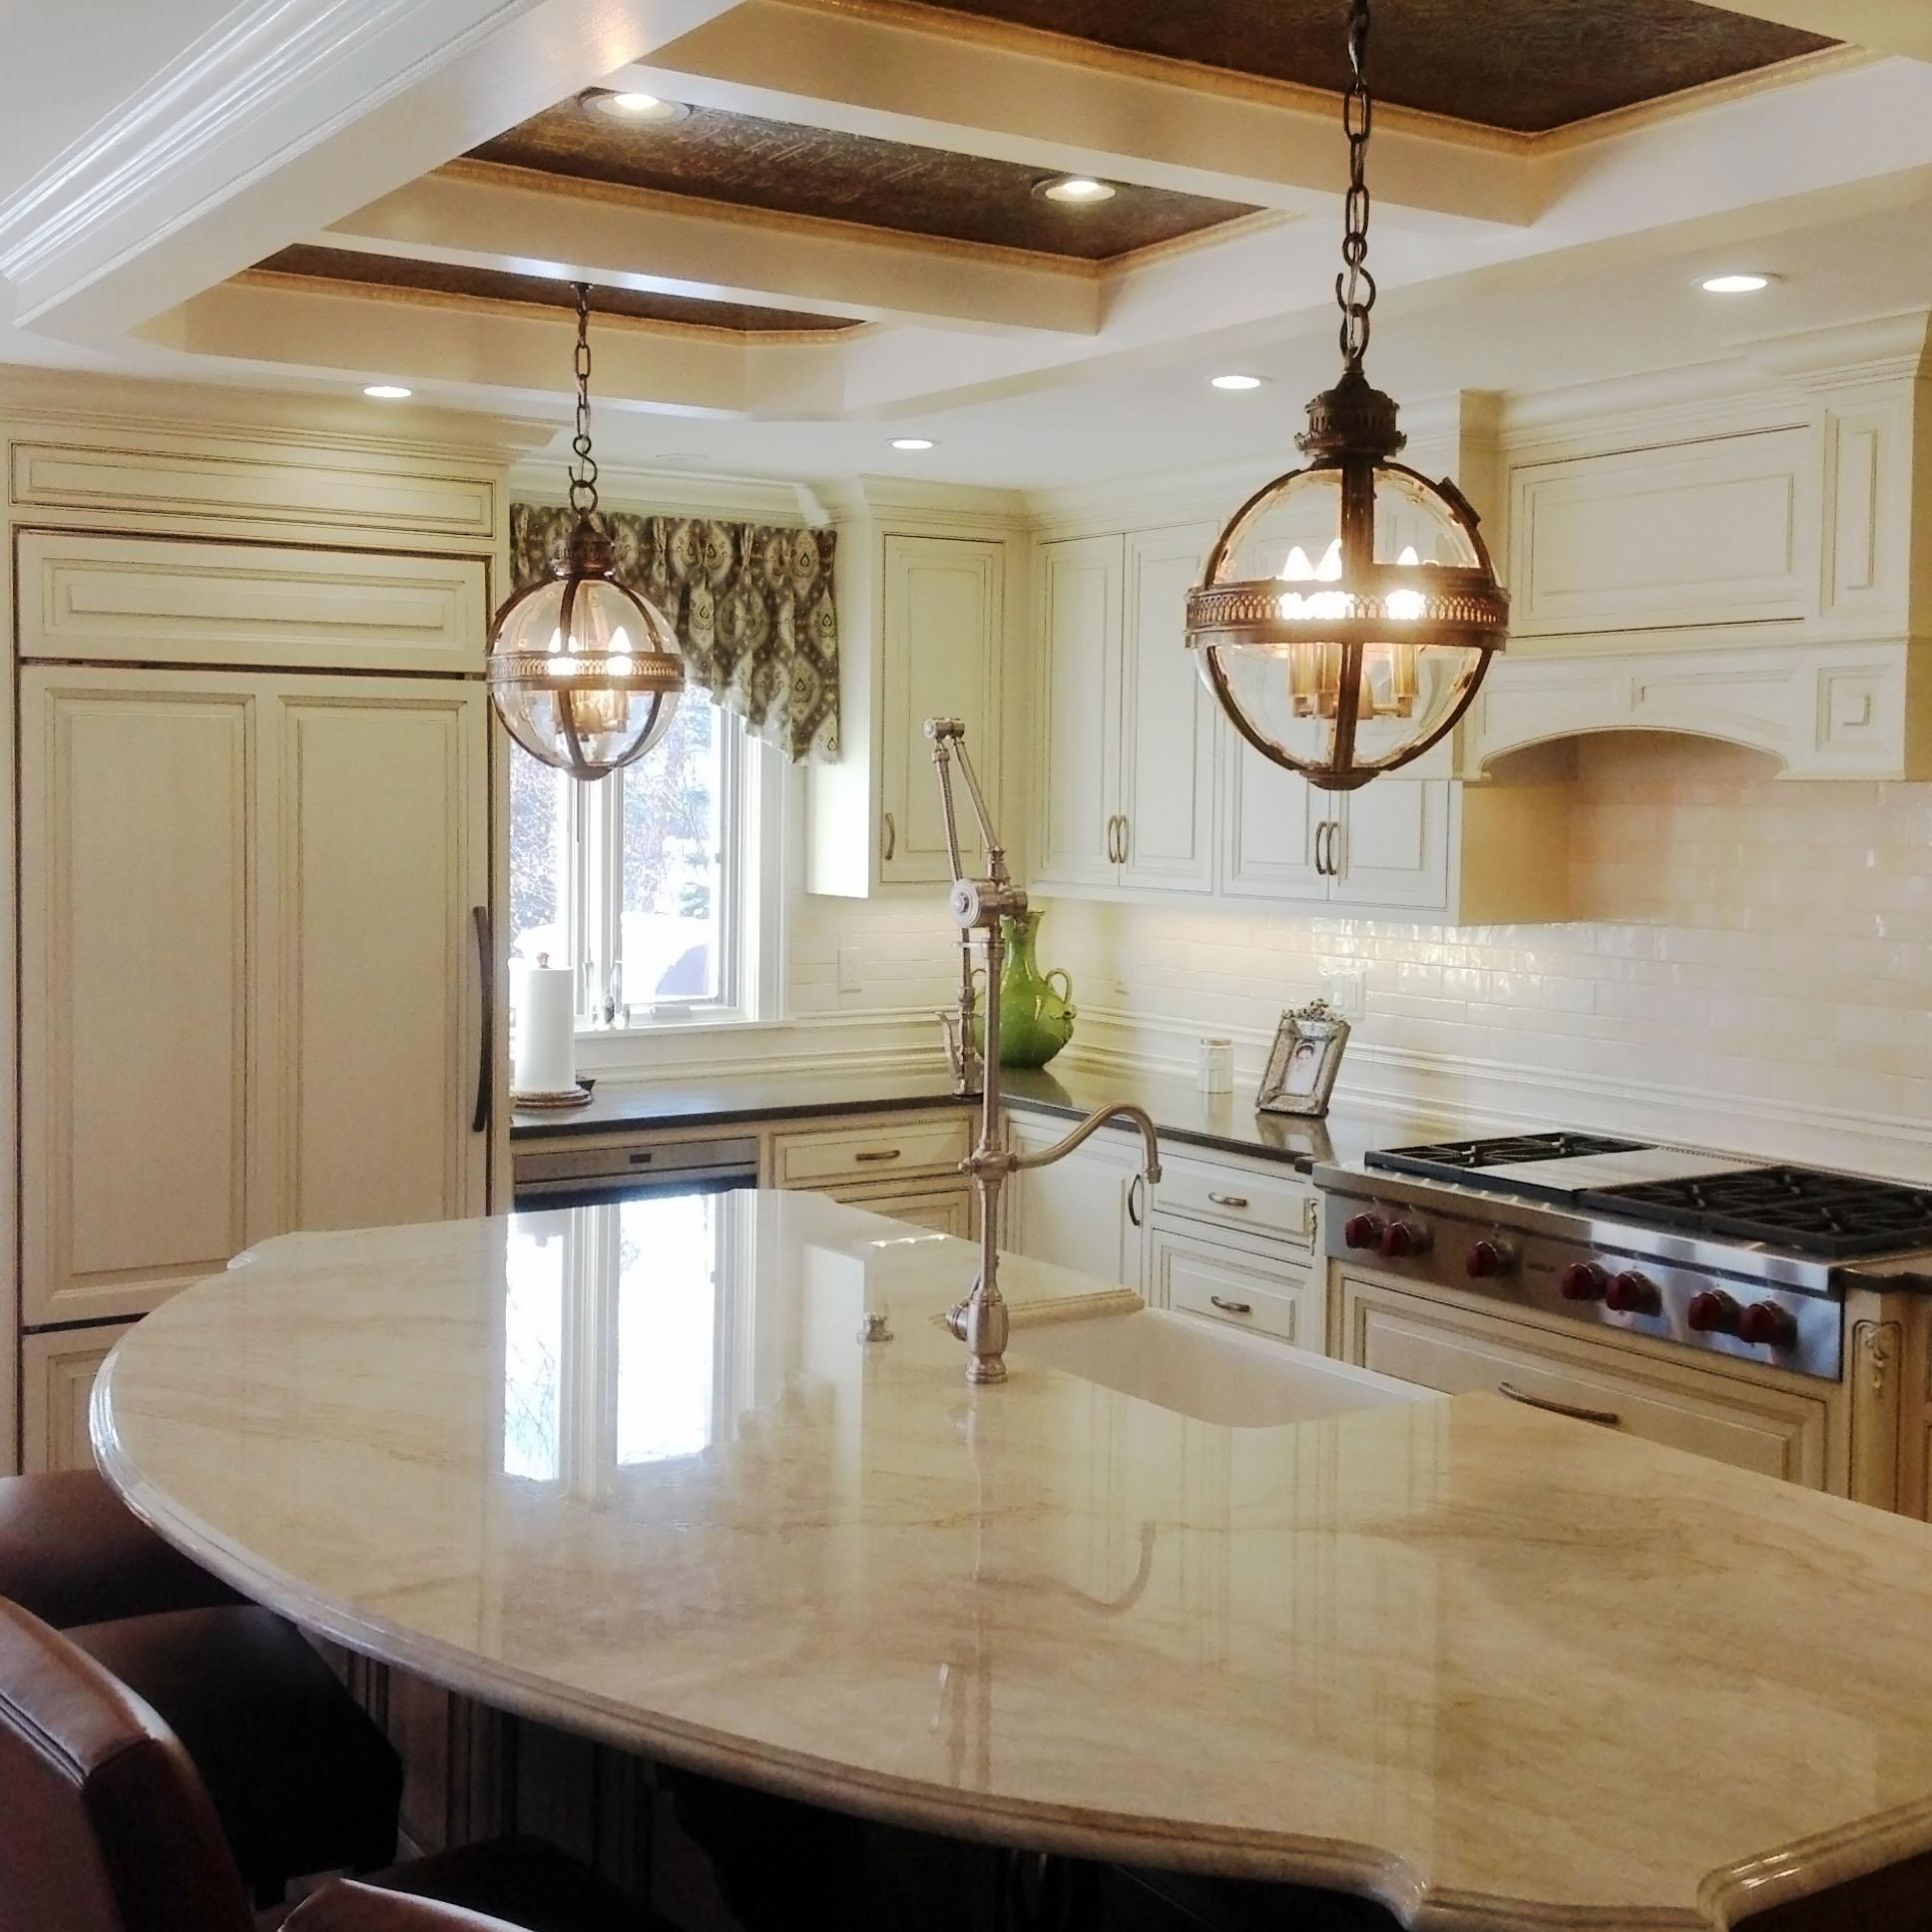 Quartzite Countertops For Kitchen : Quartzite kitchen countertops inspiration gallery